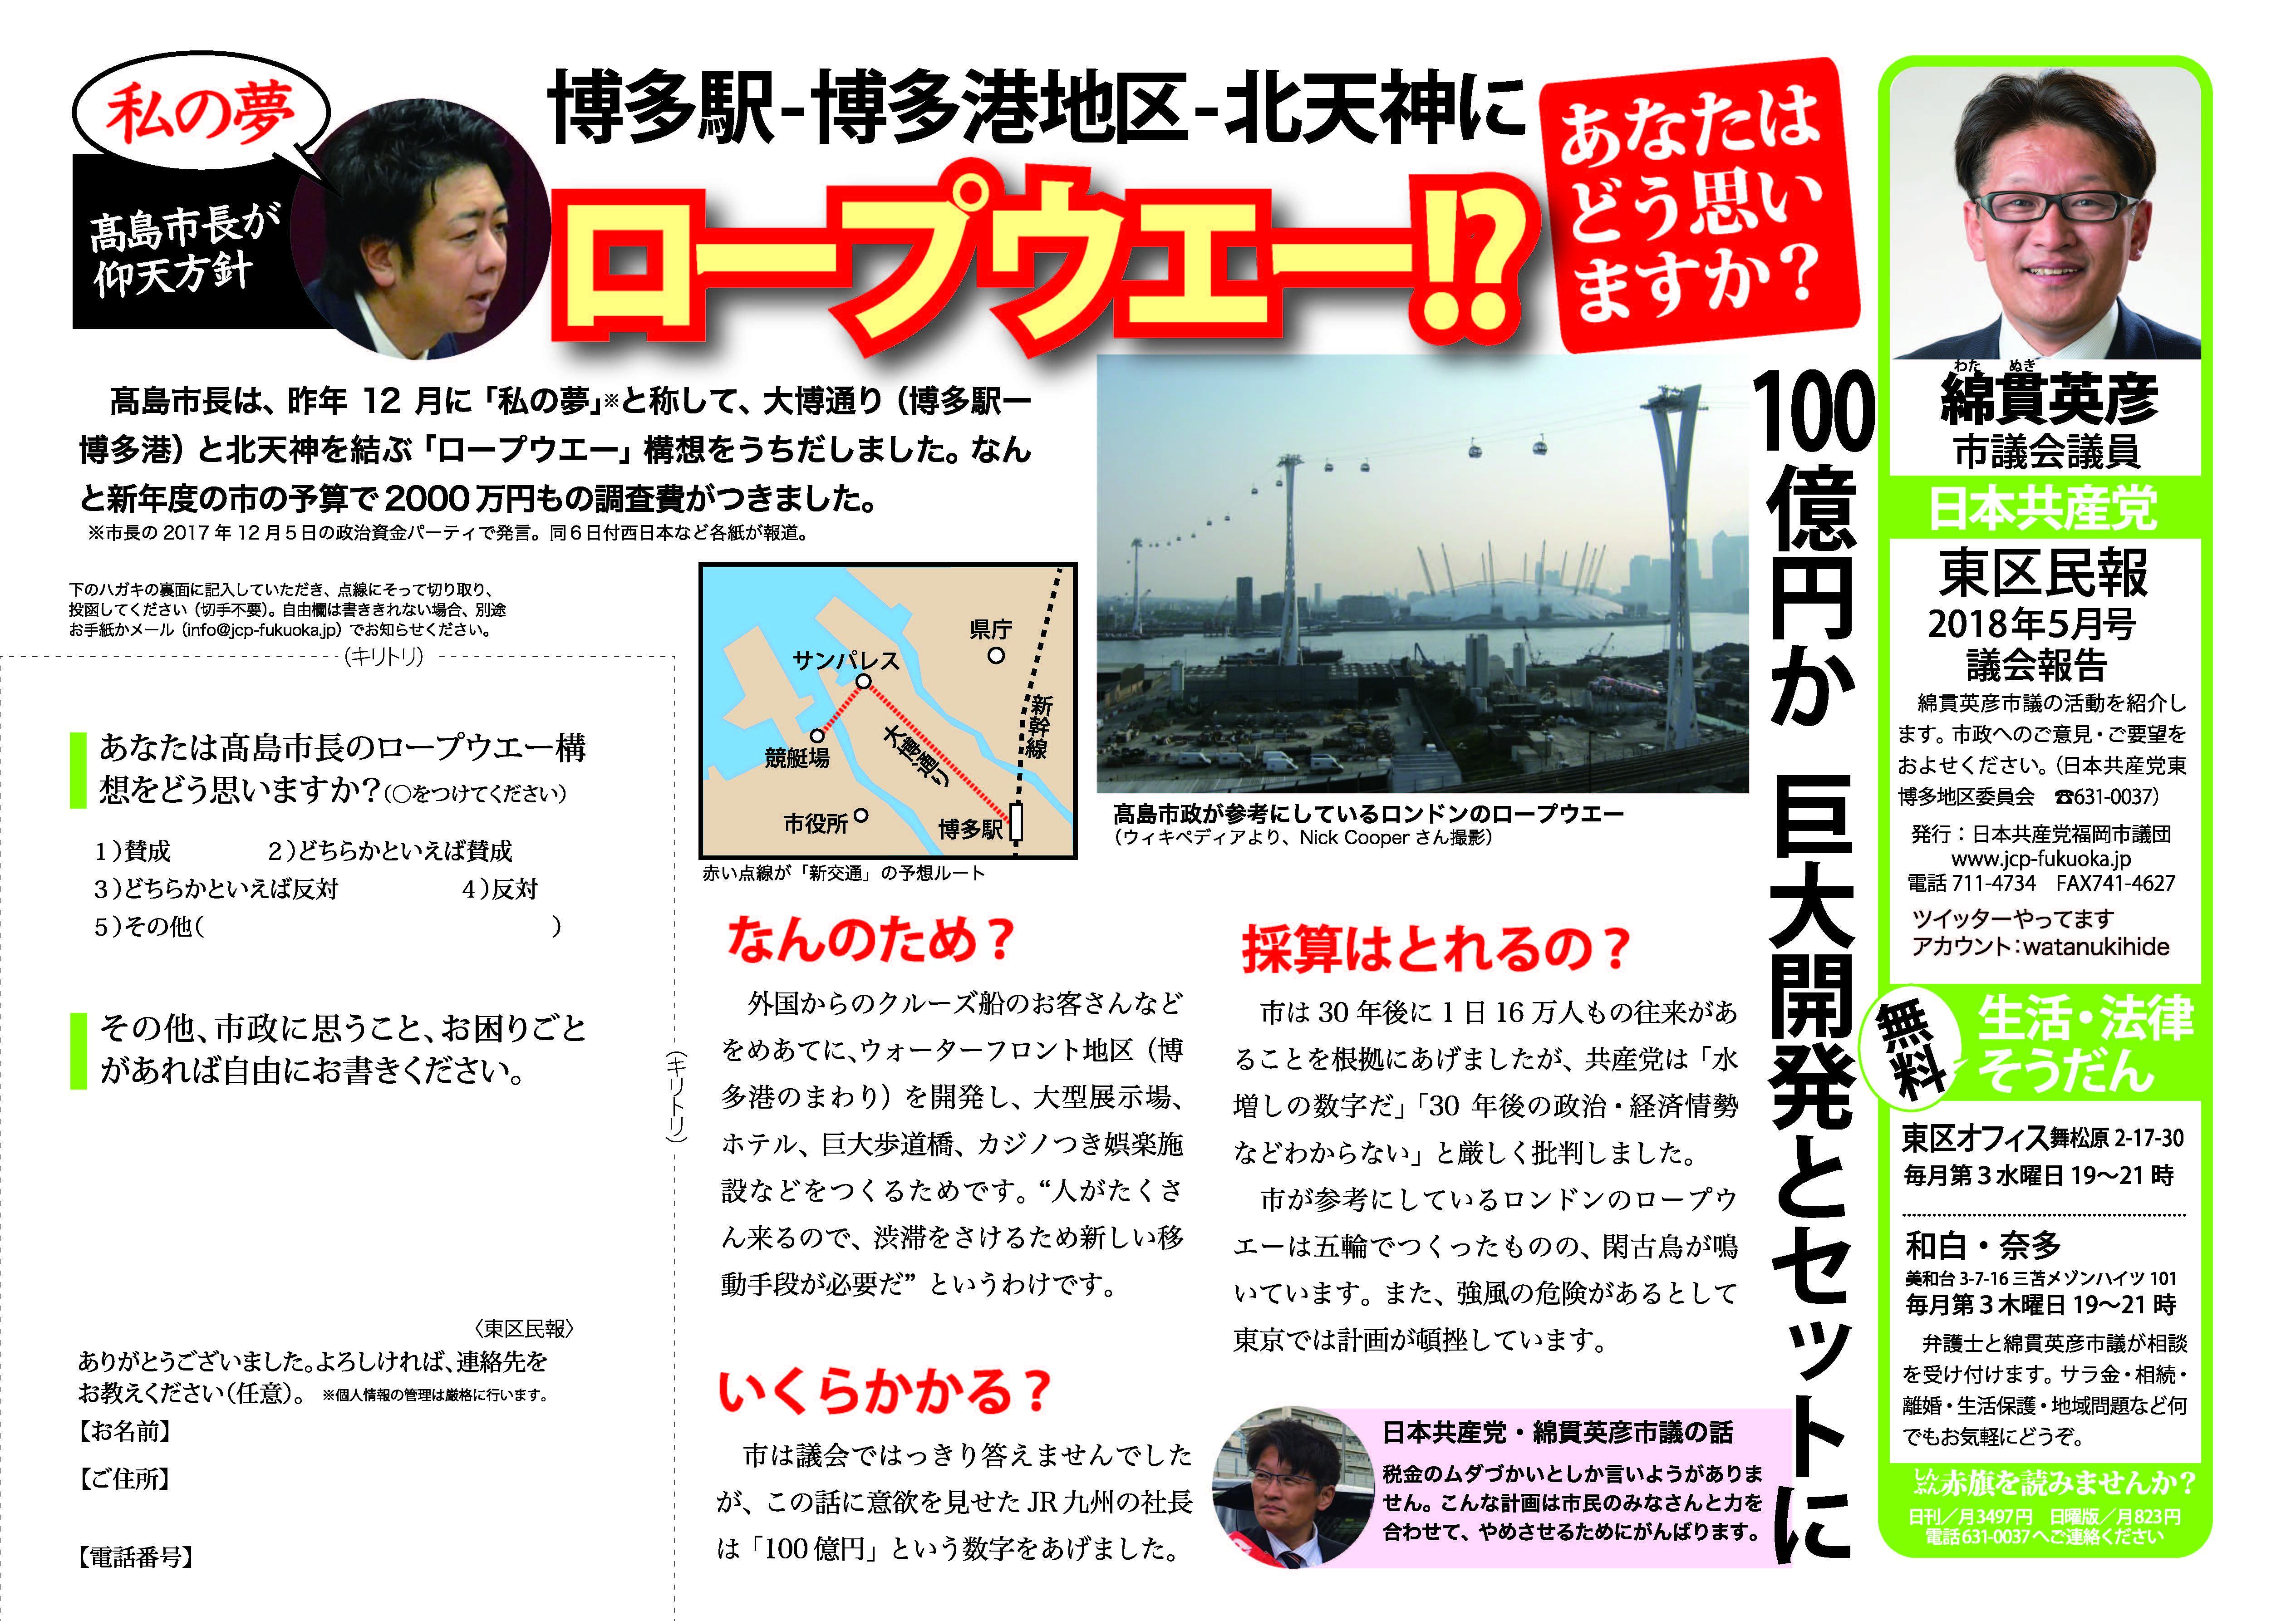 東区民報2018年5月号(ロープウエー・高齢者乗車券)【3.0MB】